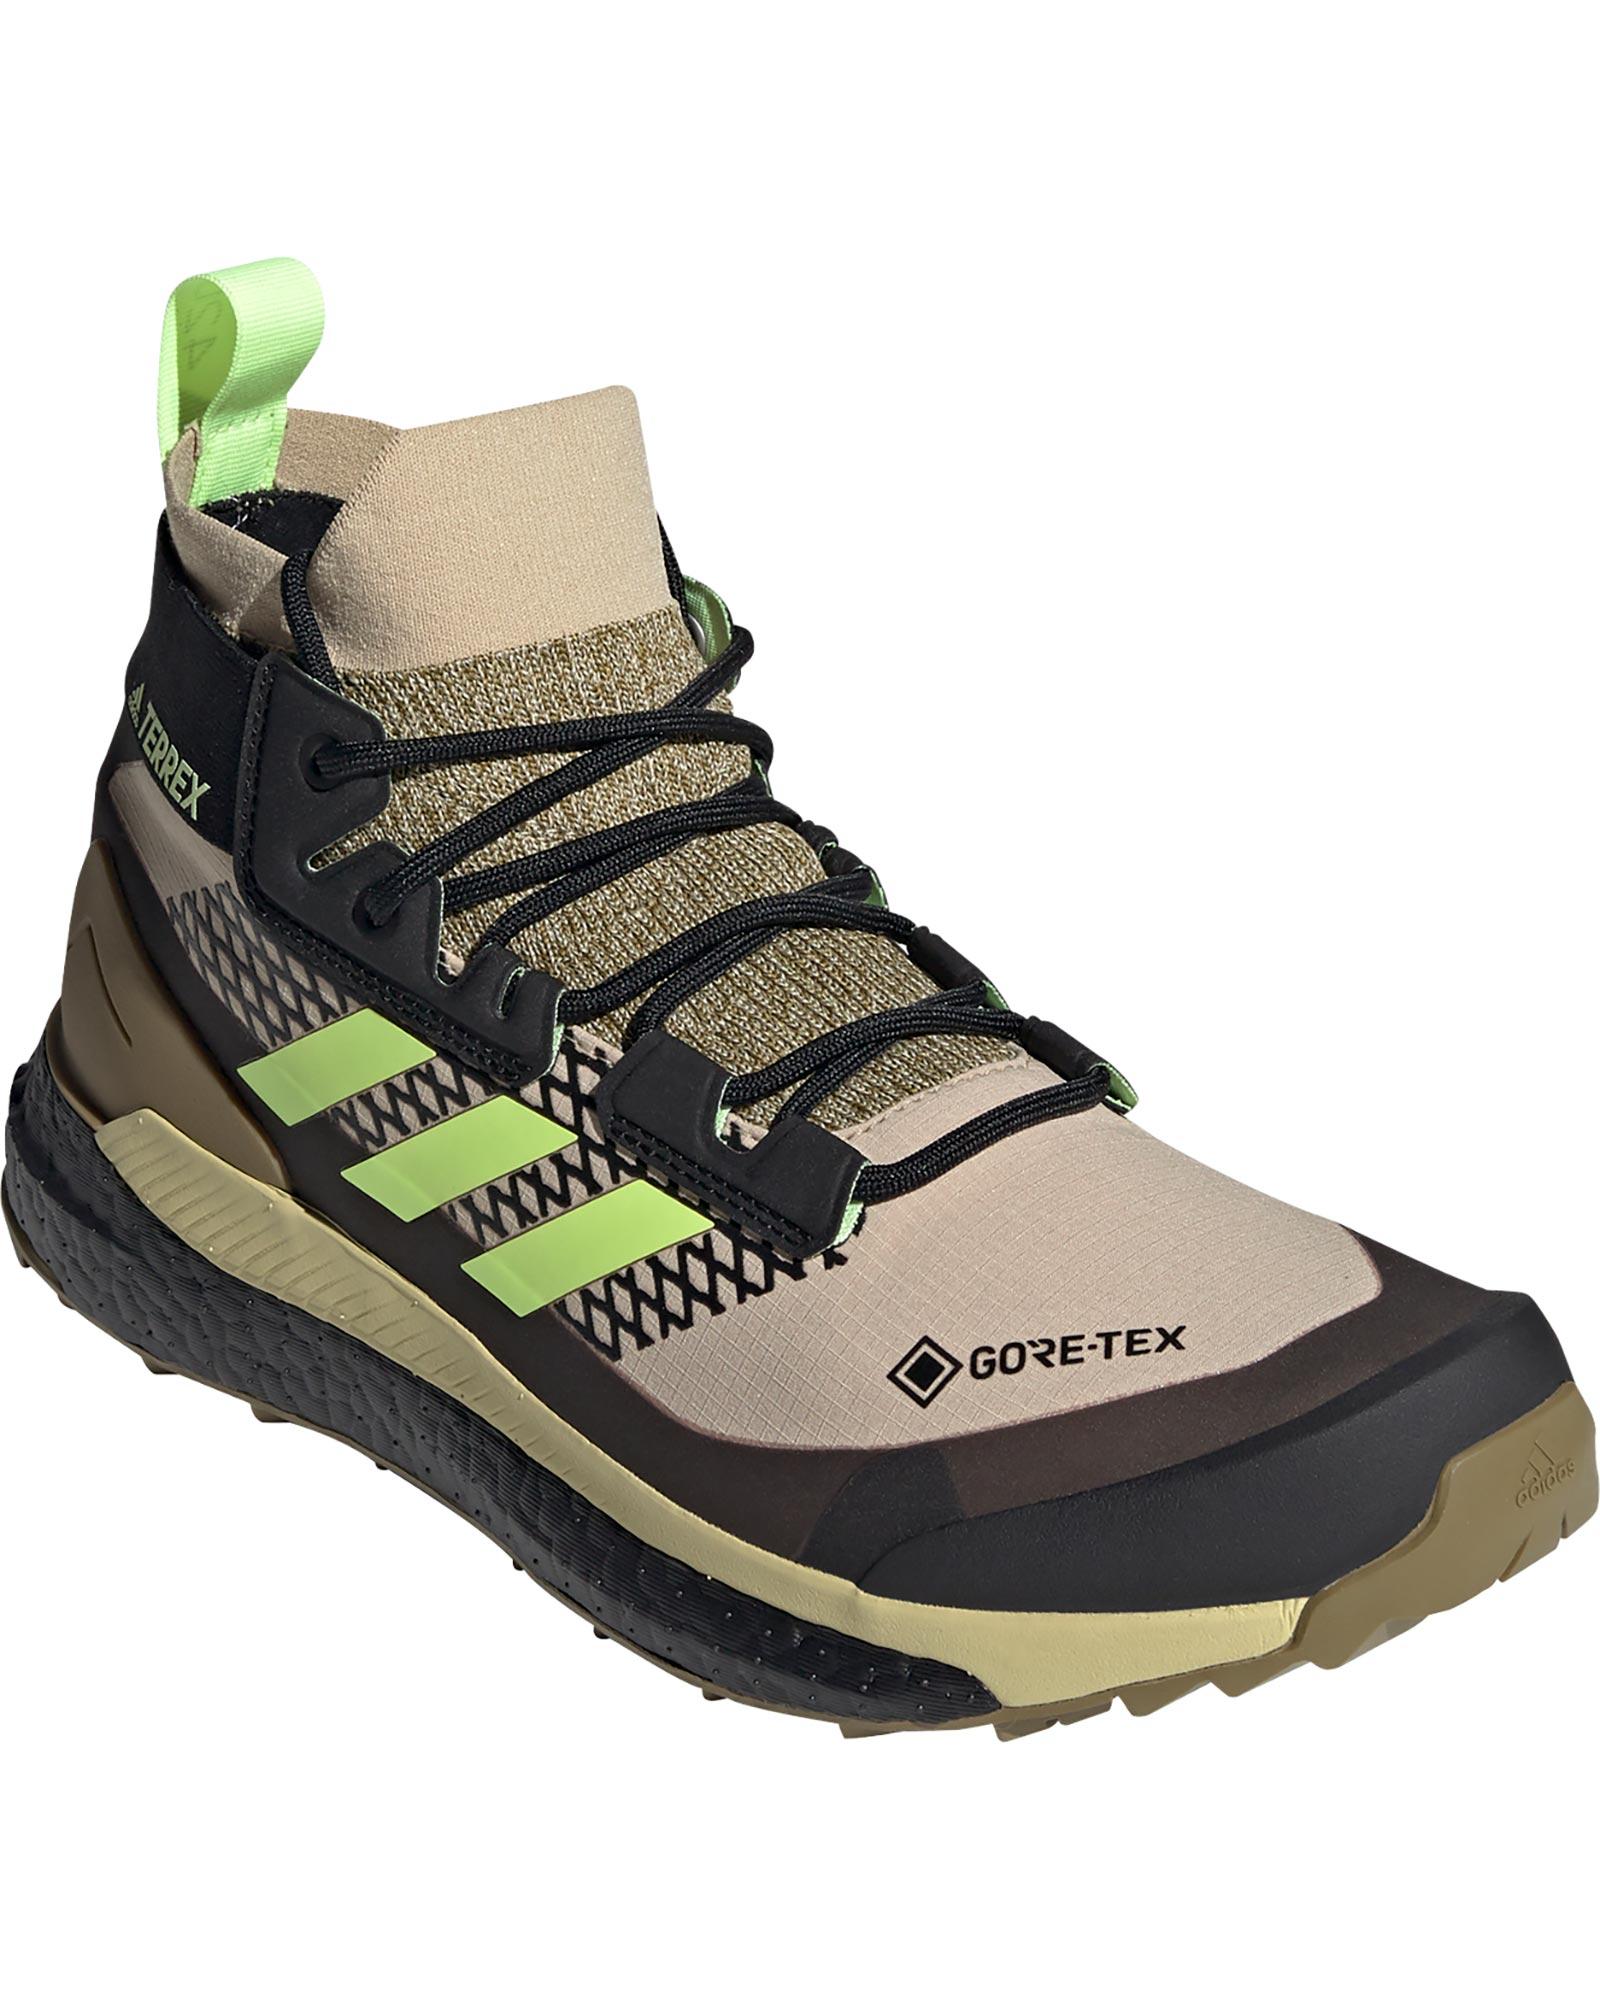 Adidas Terrex Free Hiker GORE-TEX Men's Boots 0